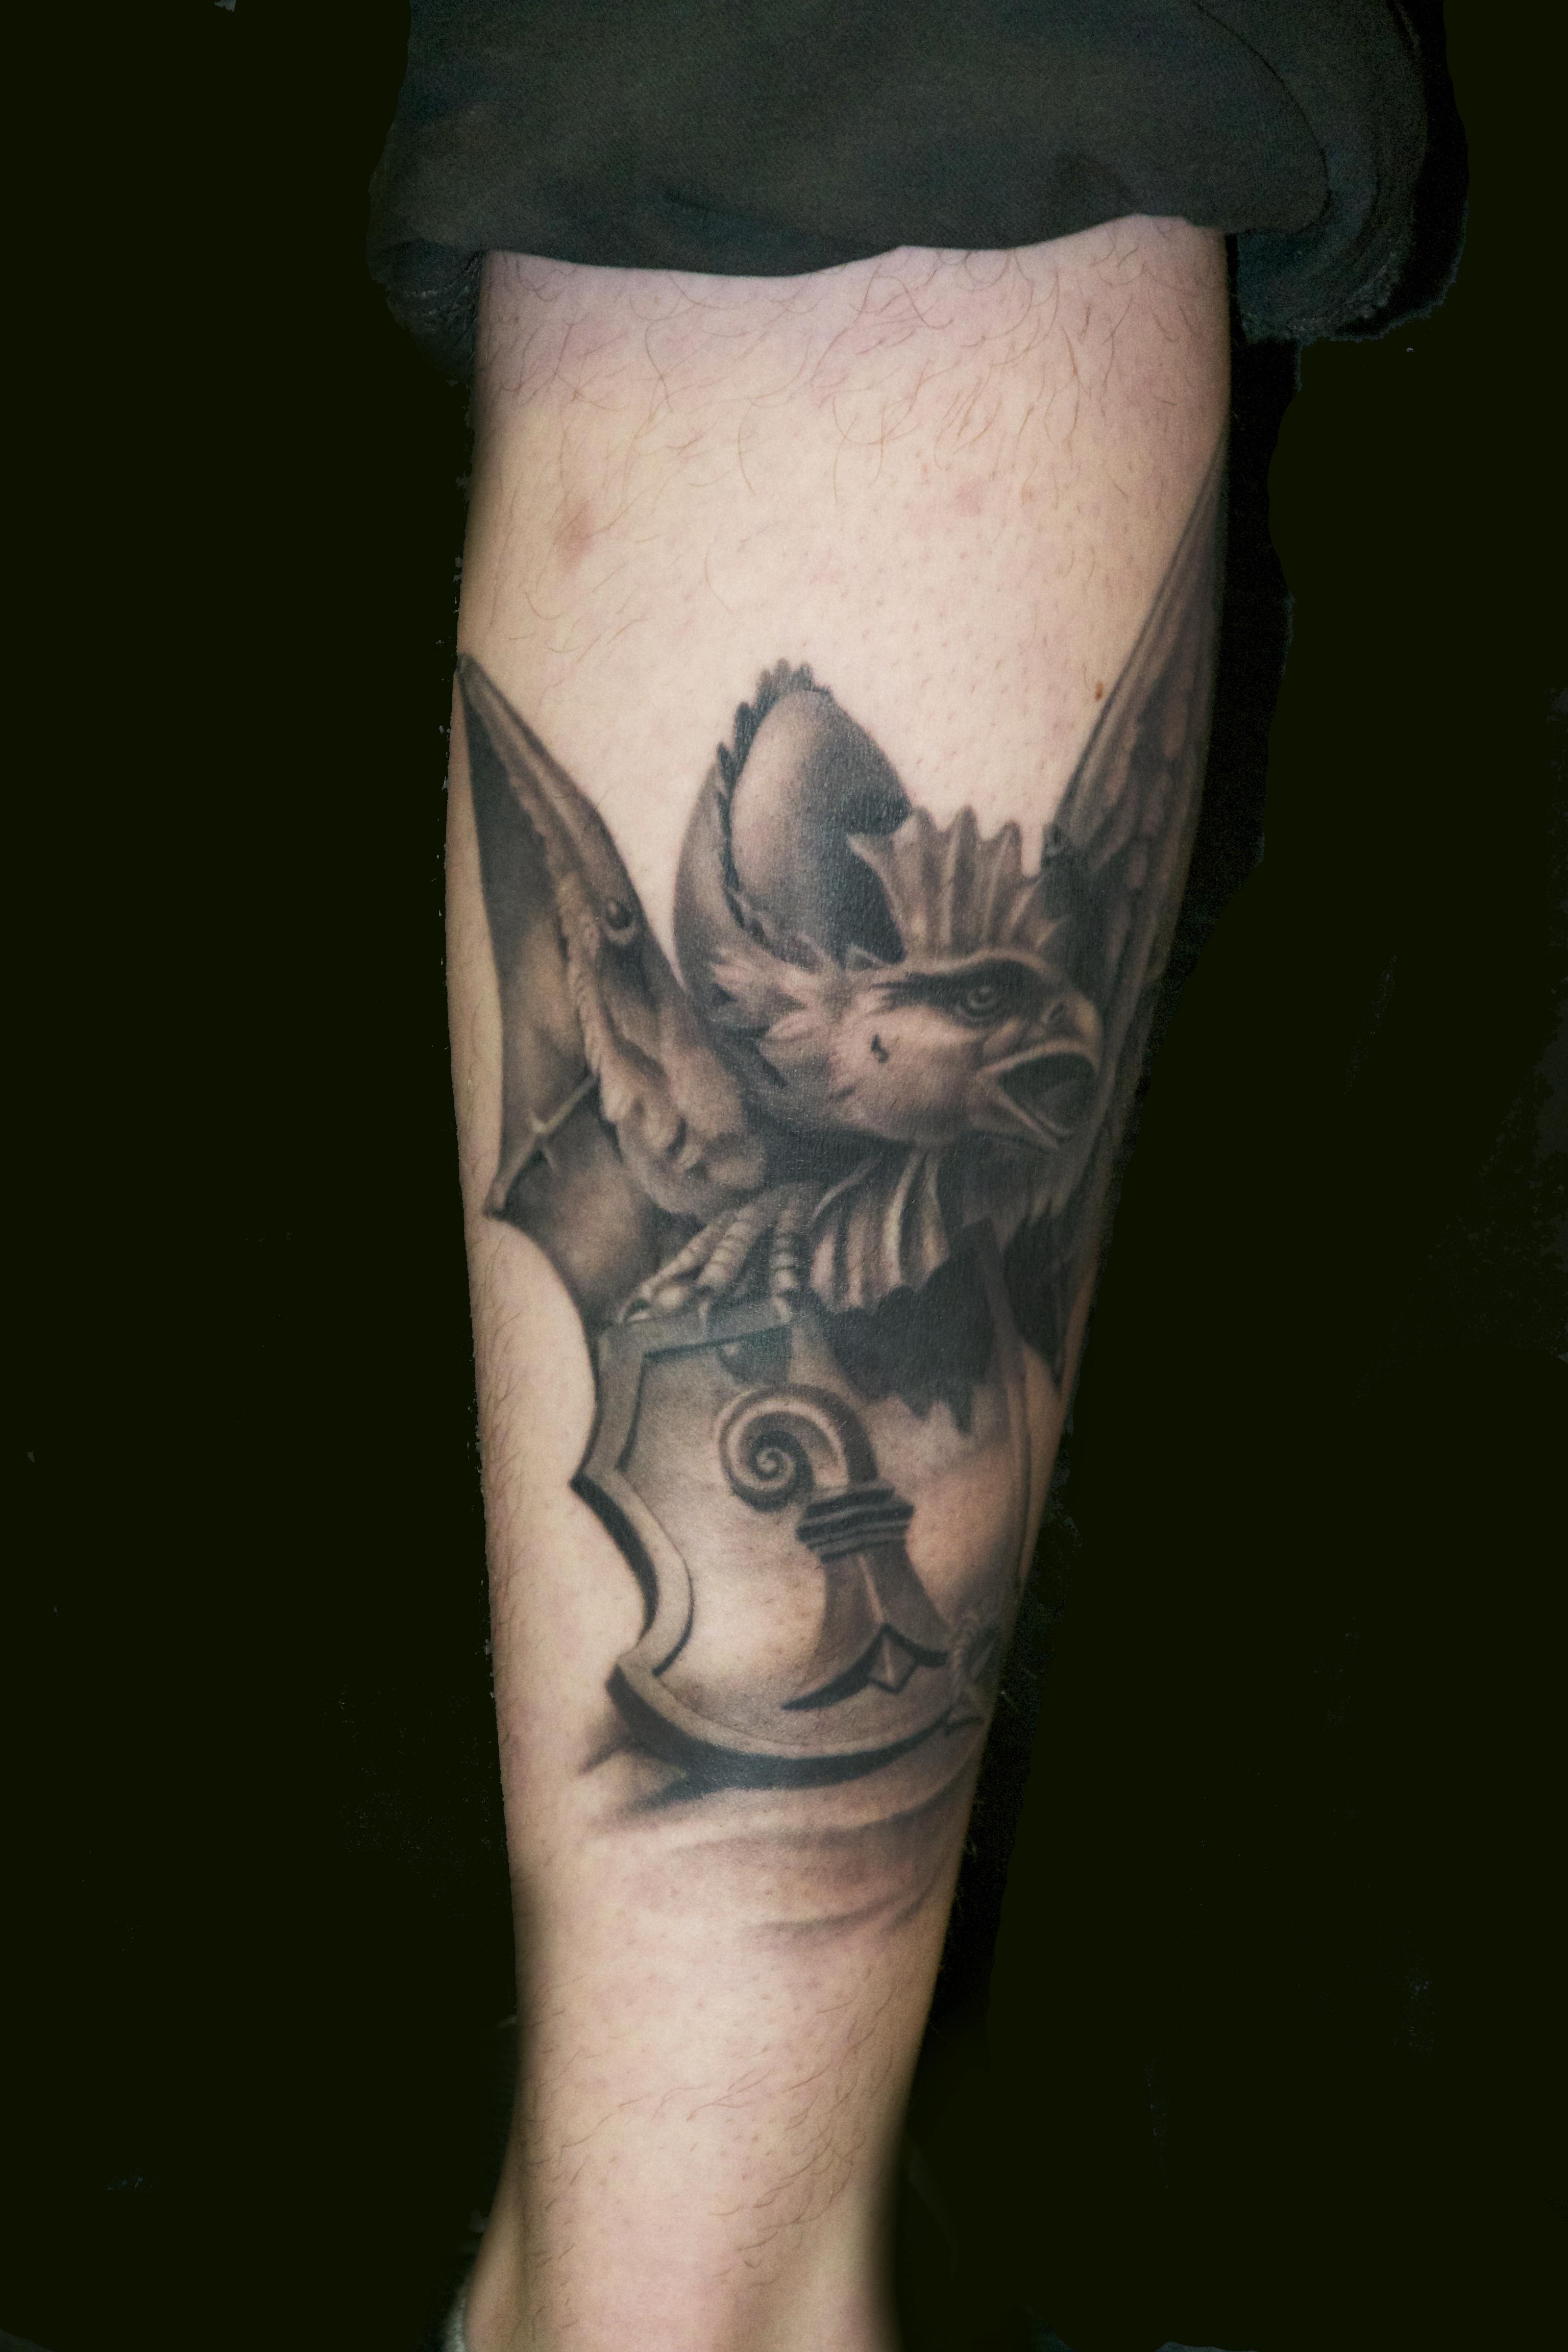 The 9th Life Tattoo Lukas Speich 02dsc 0143 2 Jpg